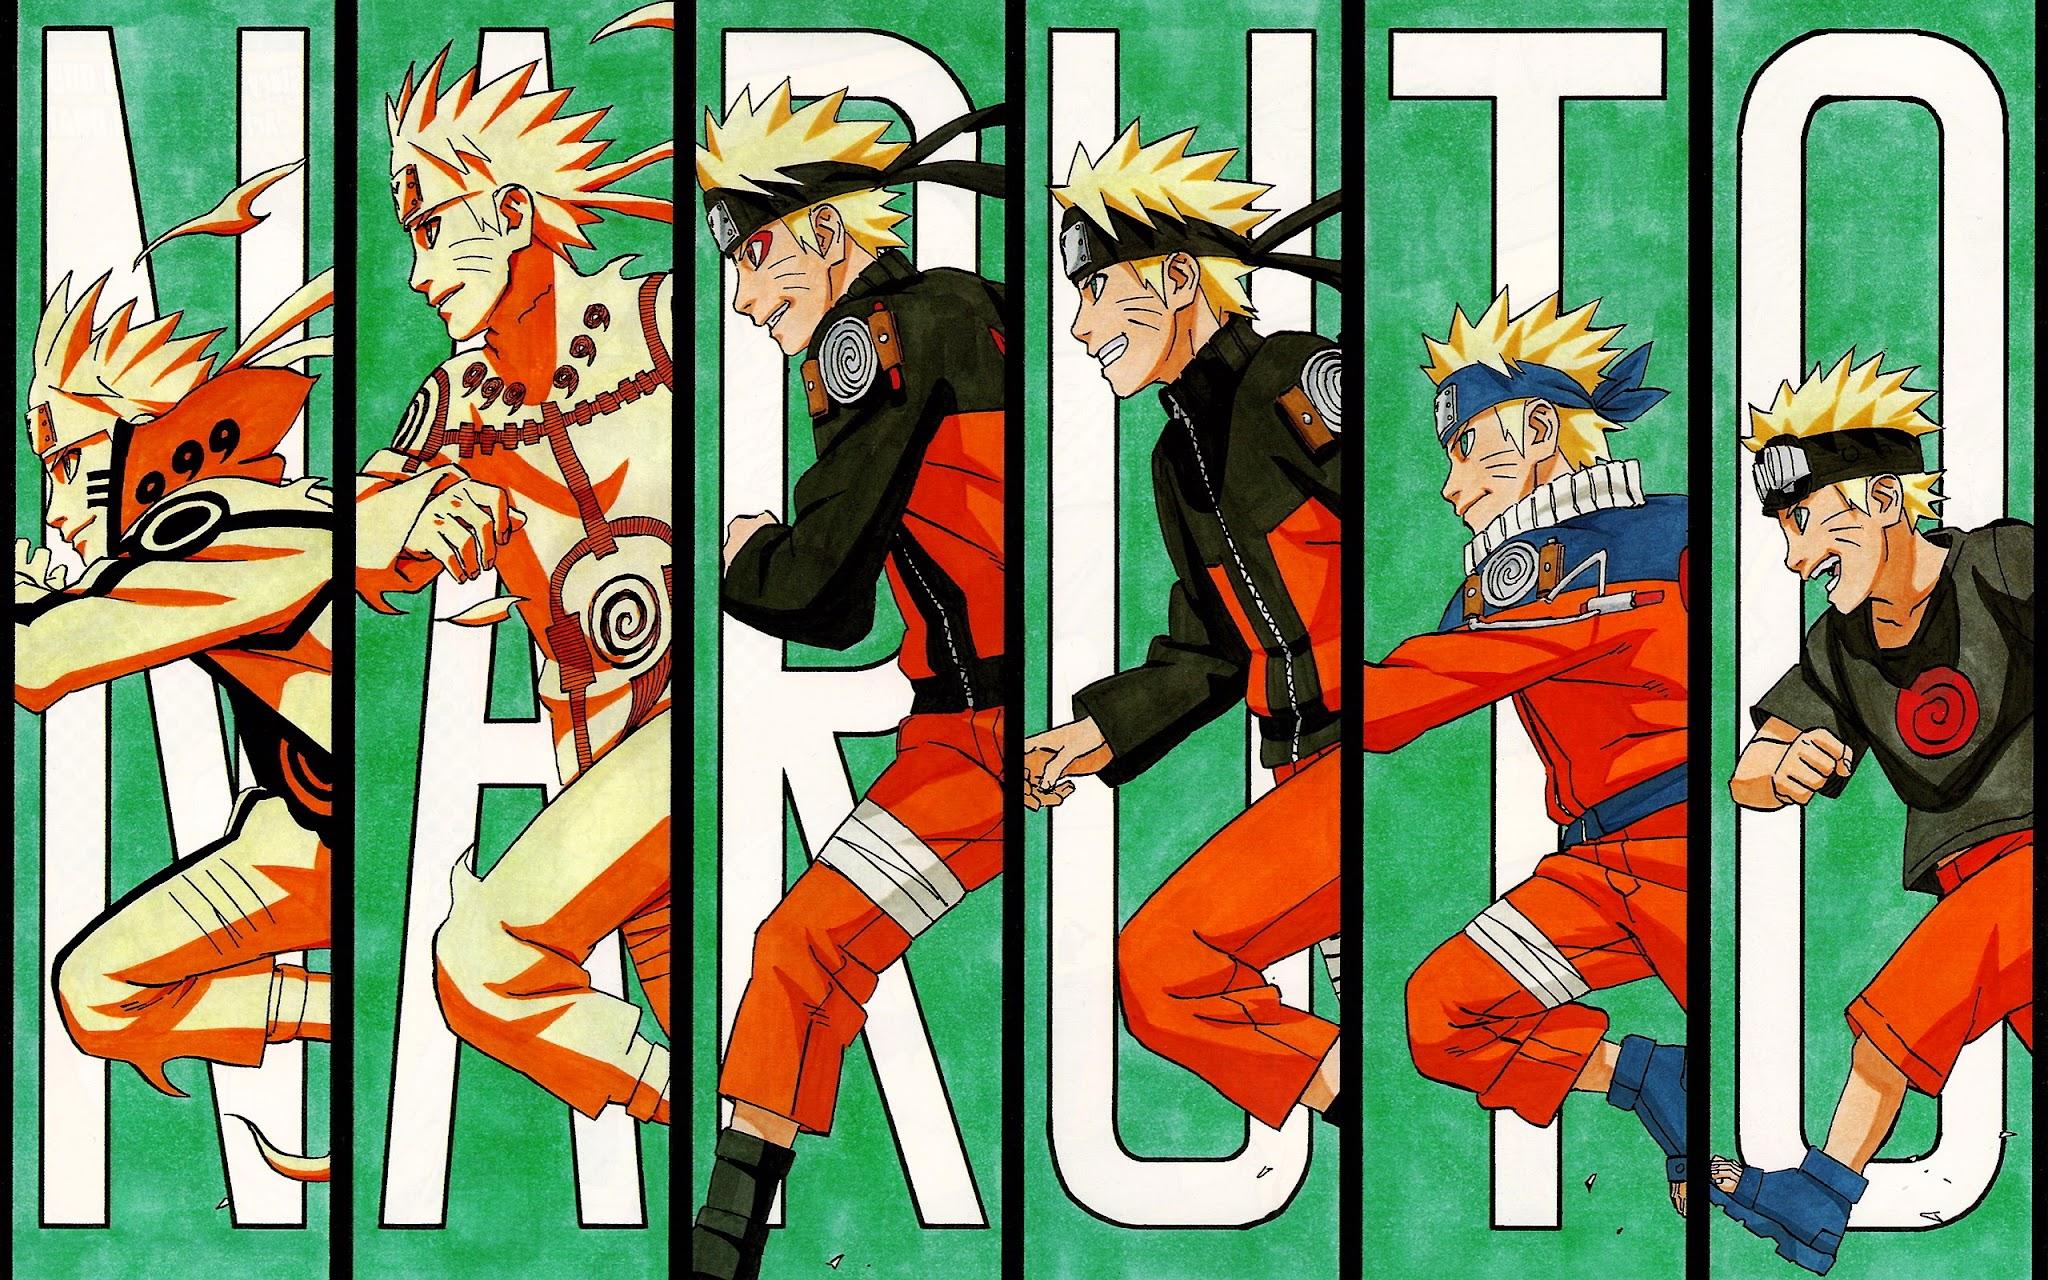 Naruto Shinpuuden Wallpaper Naruto Wallpapers Hd Android